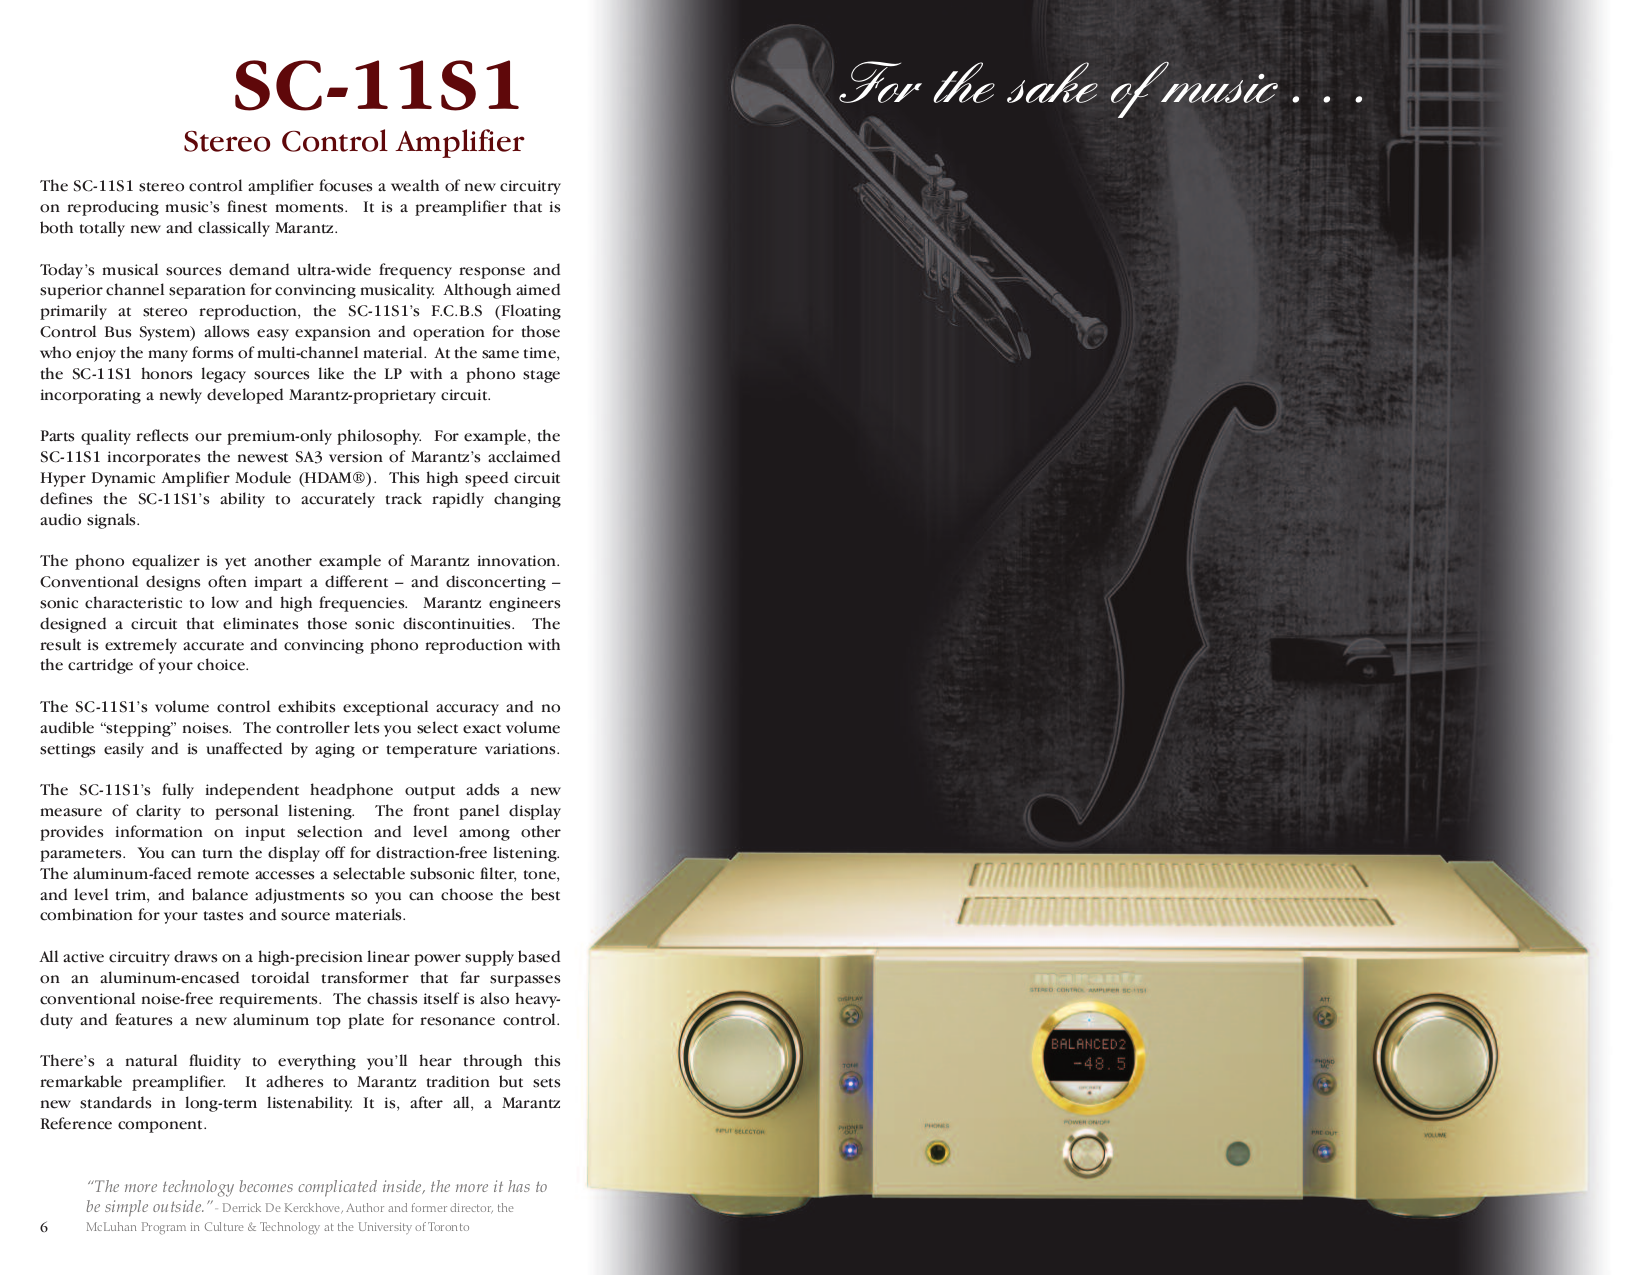 ... Marantz Amp PM-11S1 pdf page preview ...